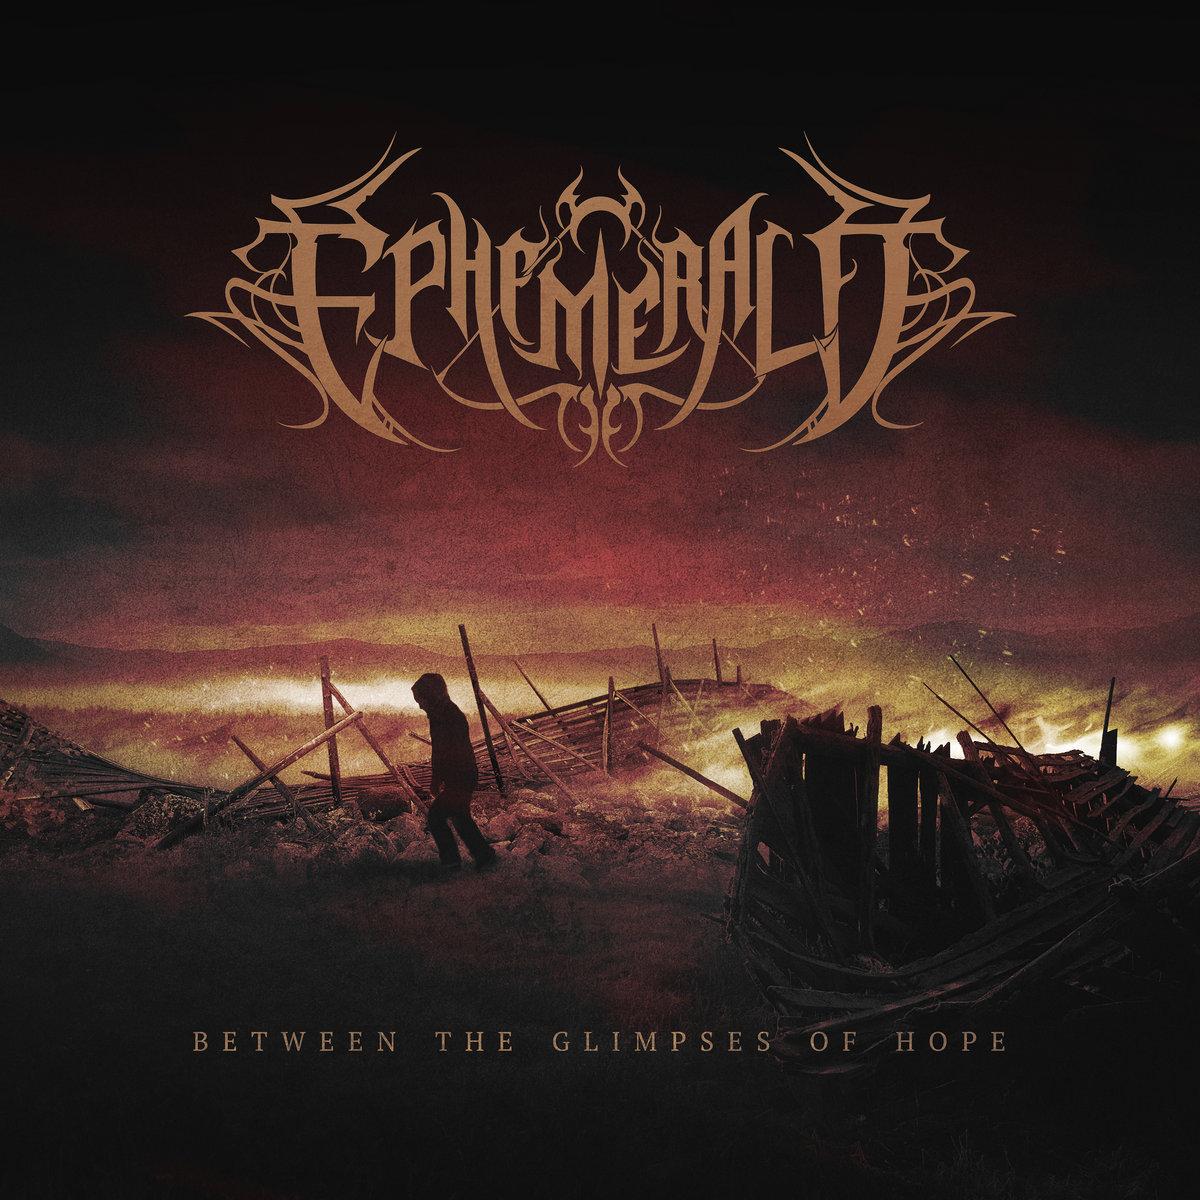 Between the Glimpses of Hope Ephemerald Album Cover Artwork